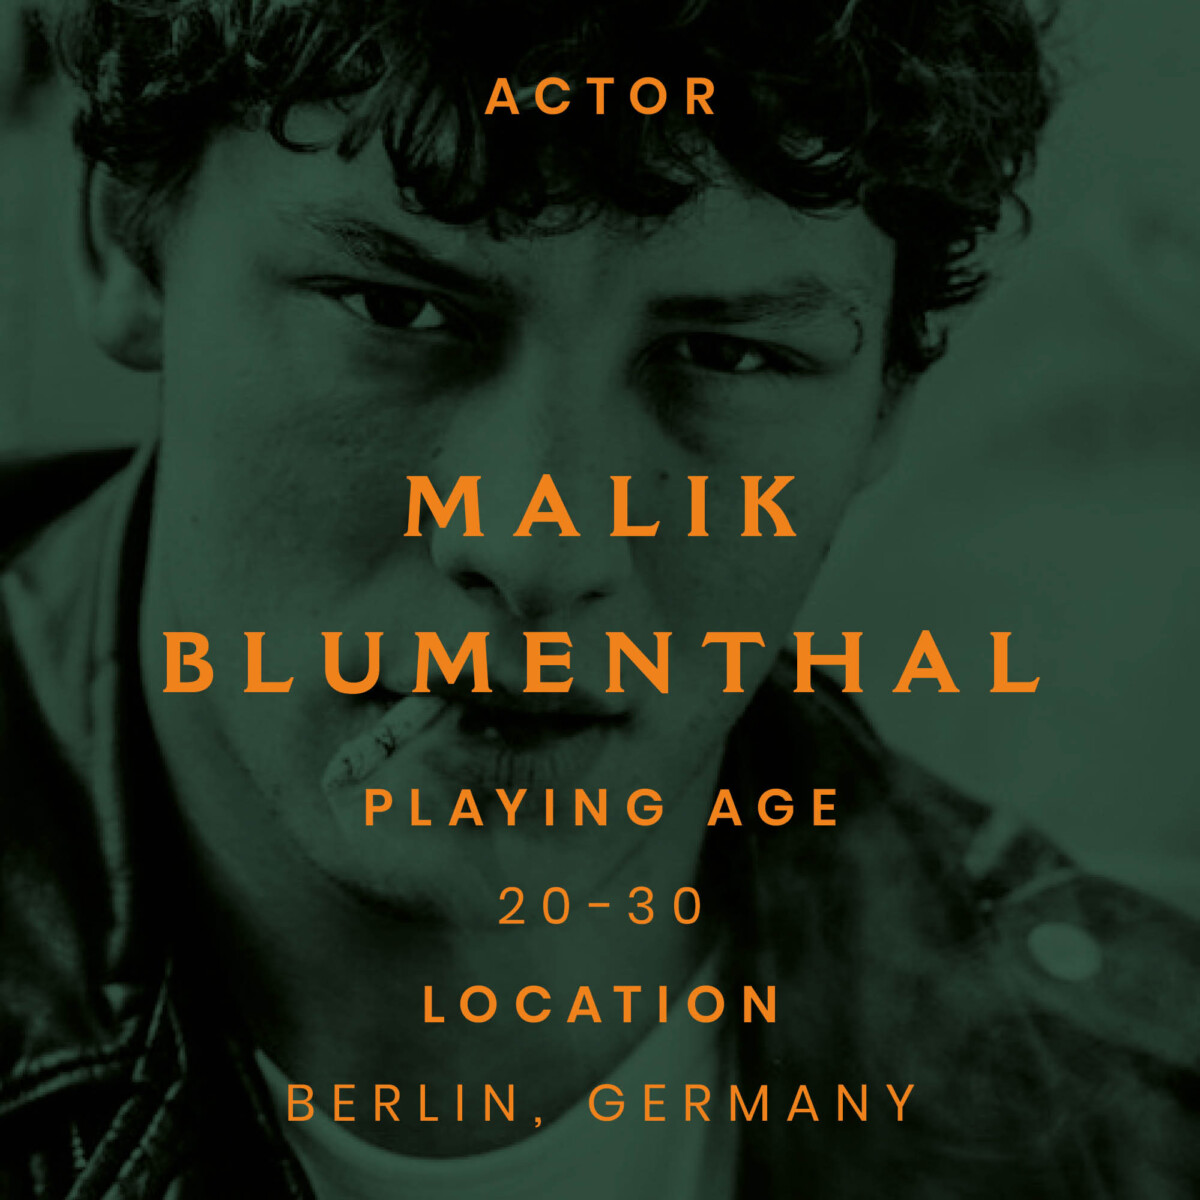 malik, Berlin, actor